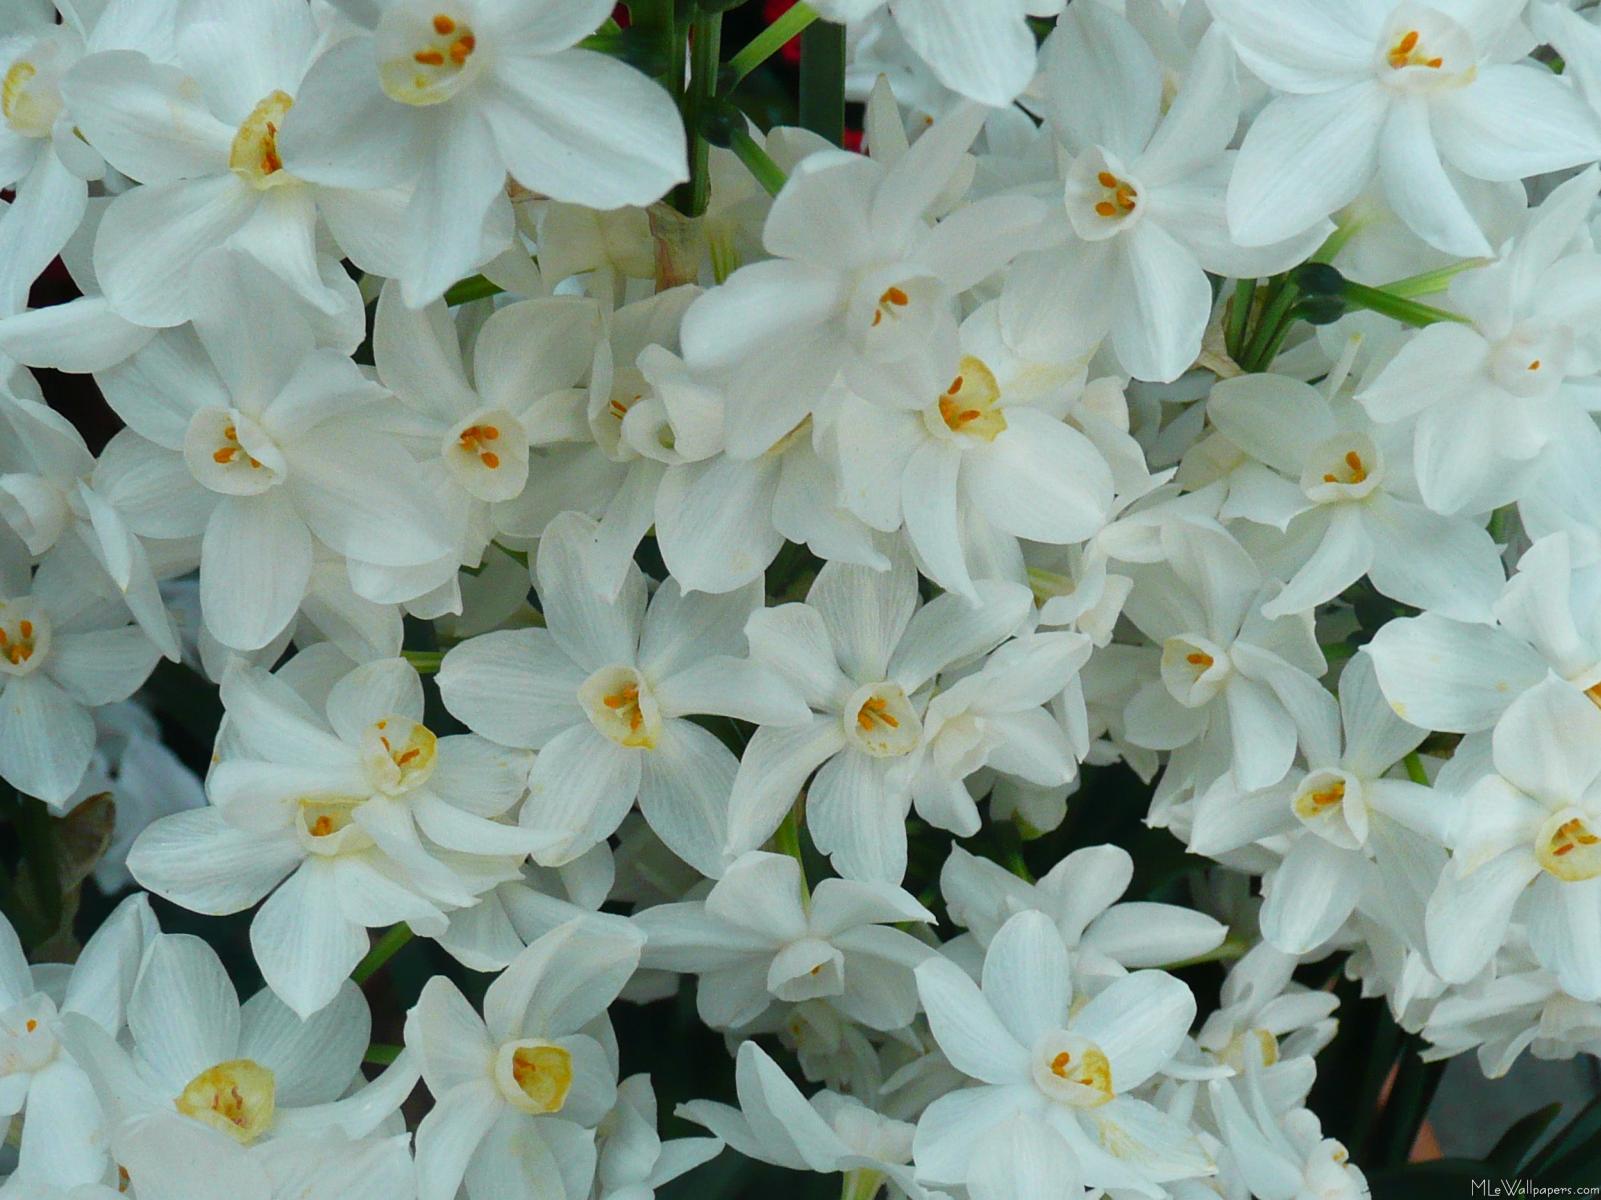 MLeWallpapers.com - Daffodils